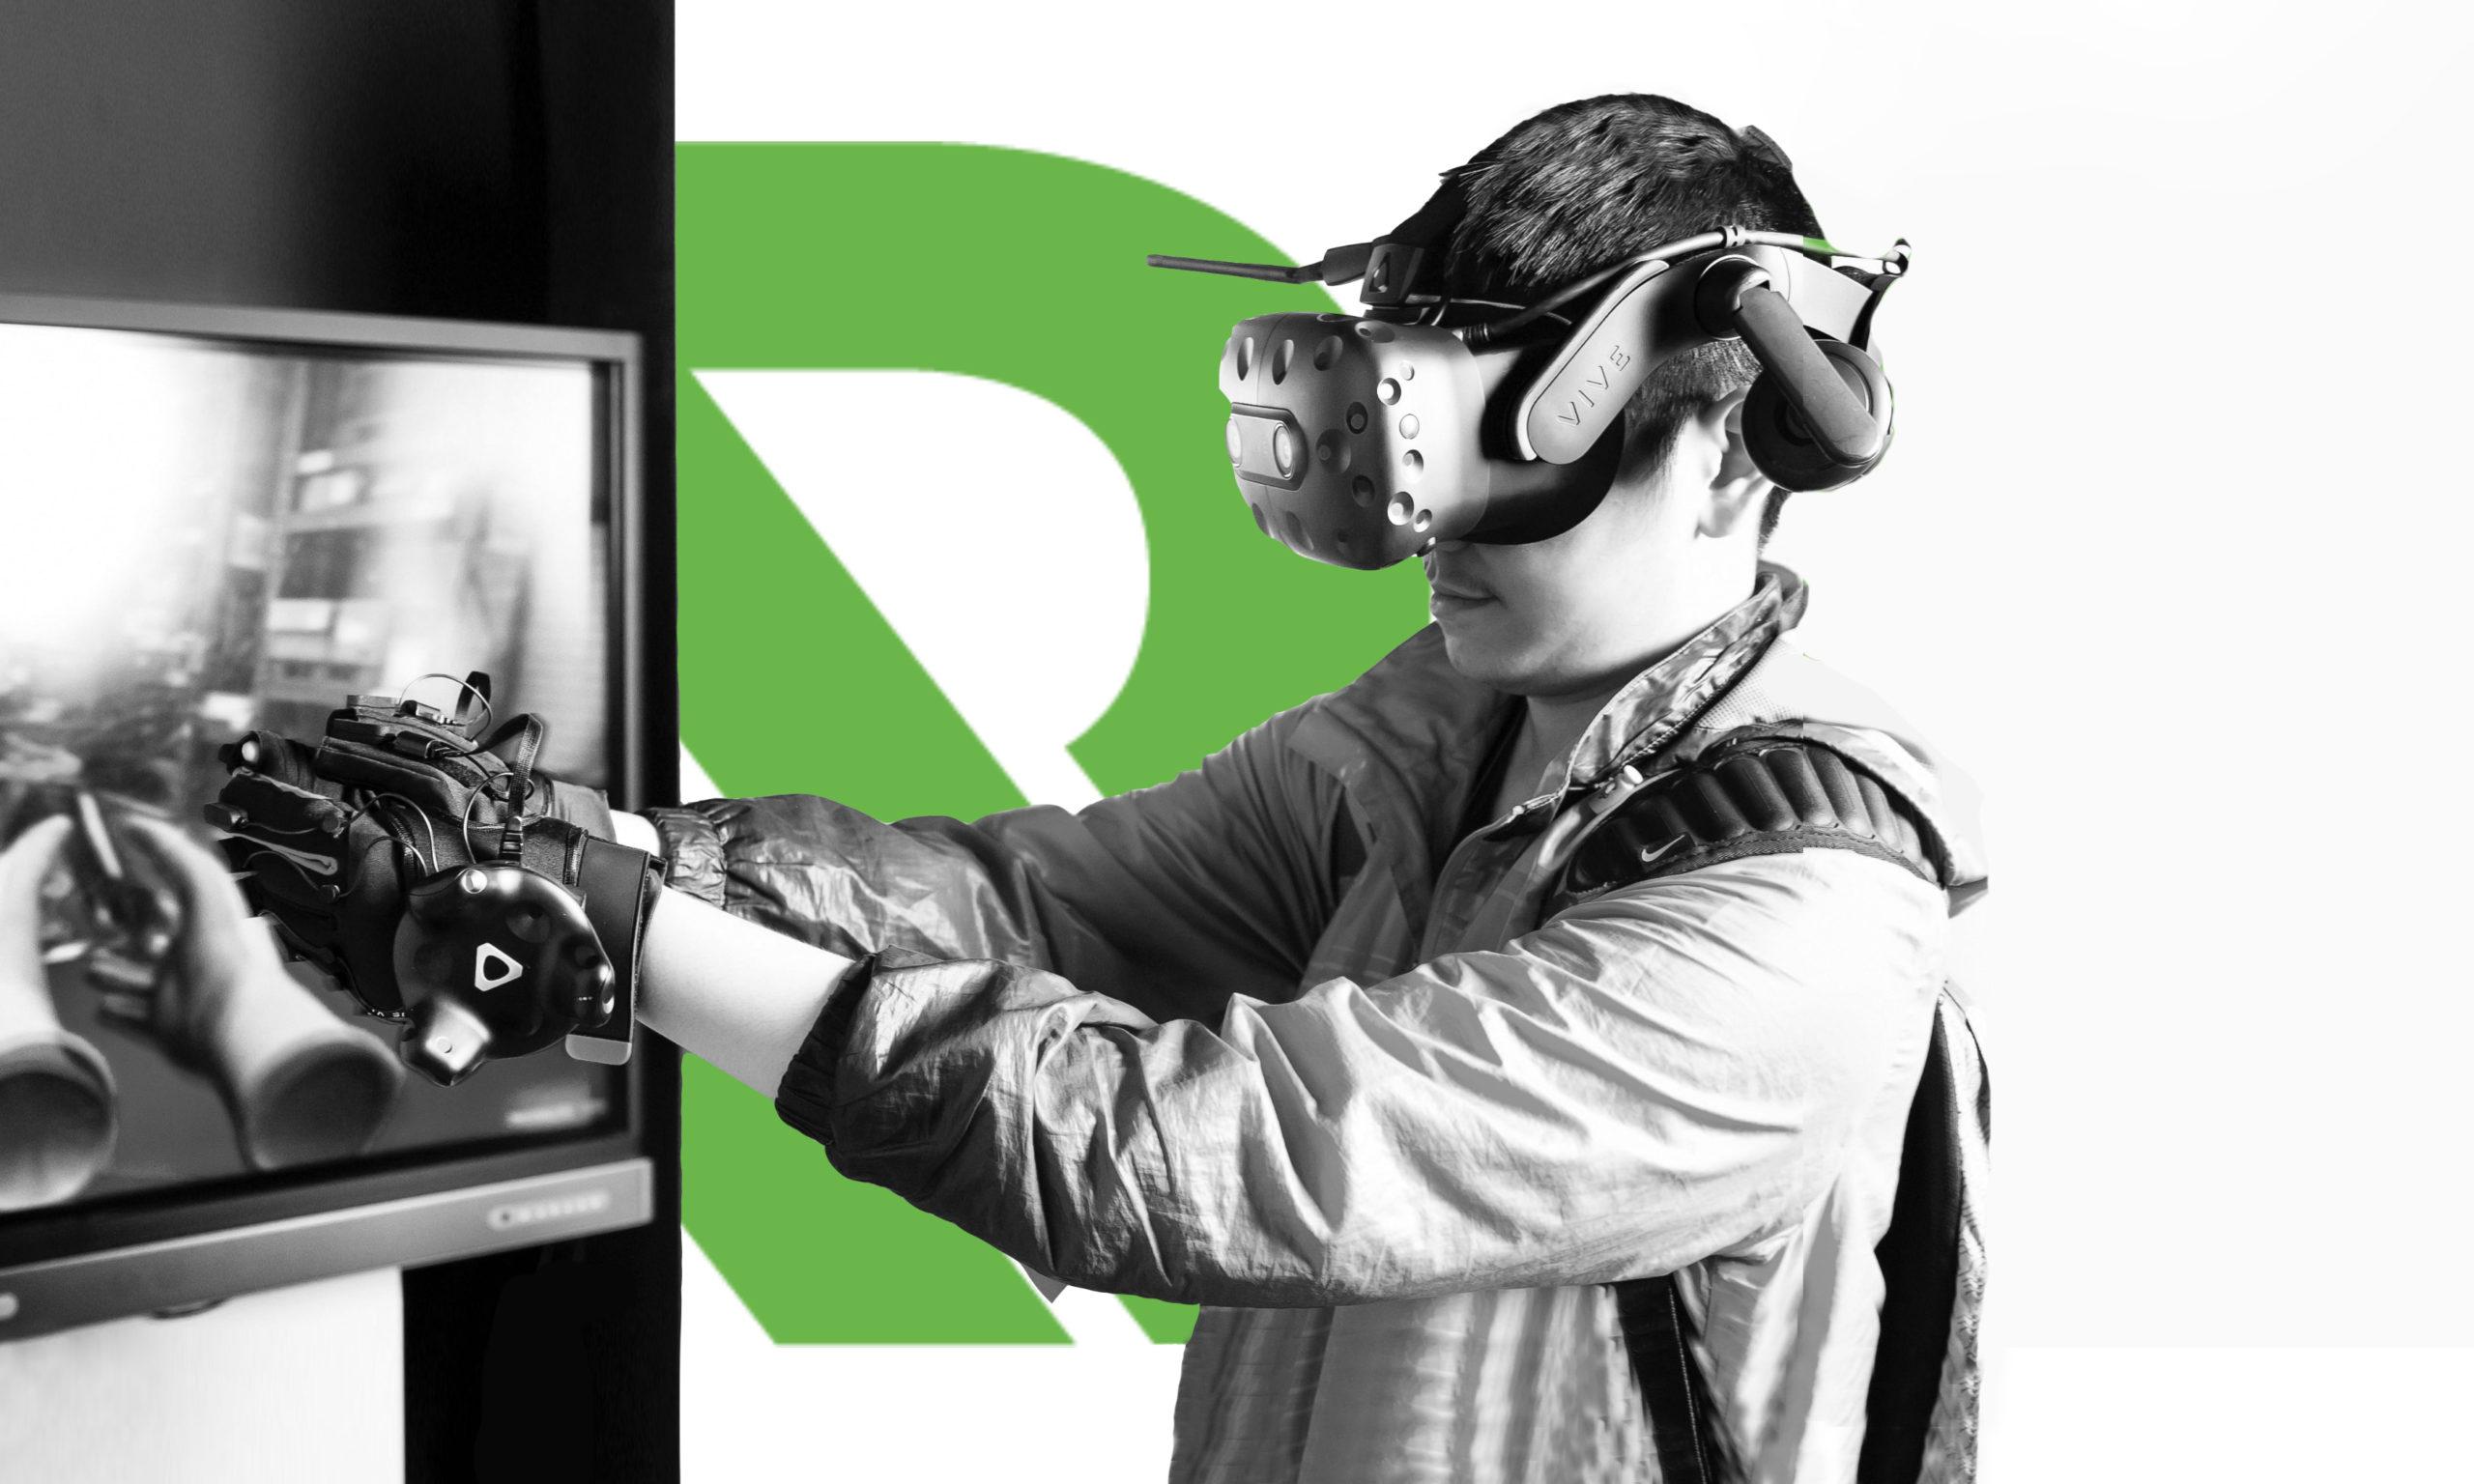 AR e AI nell'industria manifatturiera